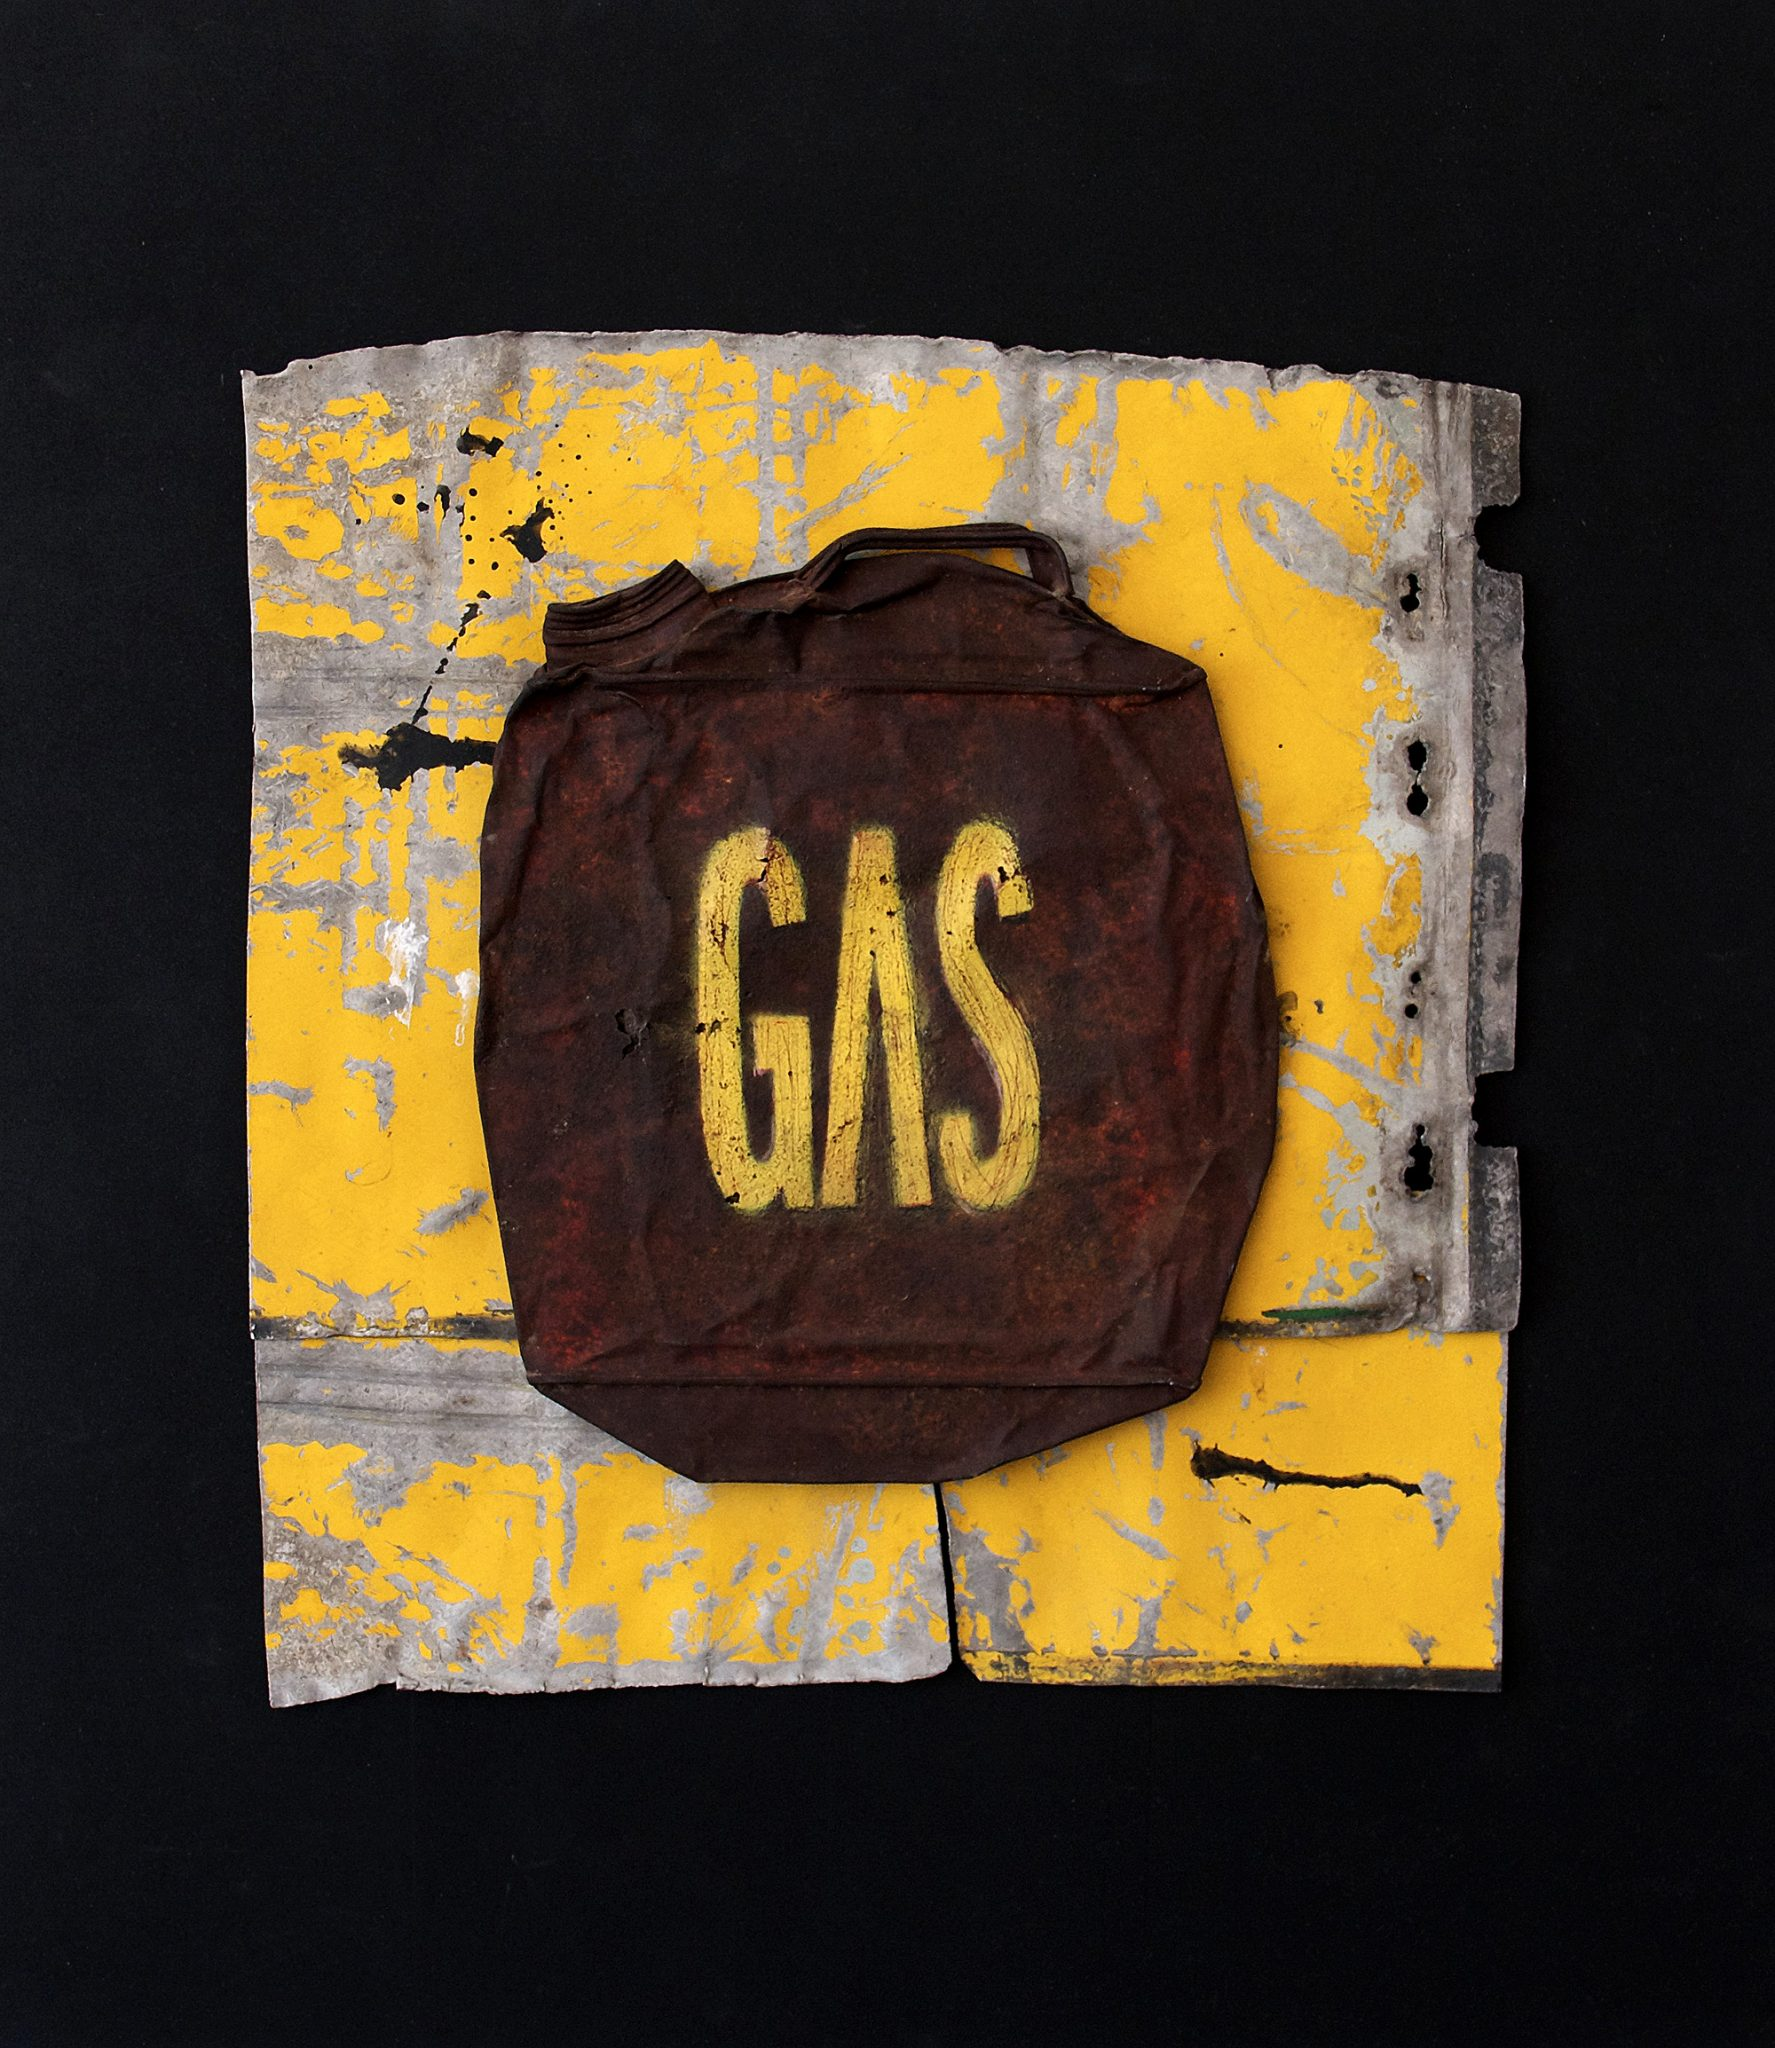 Fabio-Zanino-Assemblage-Gas-2011